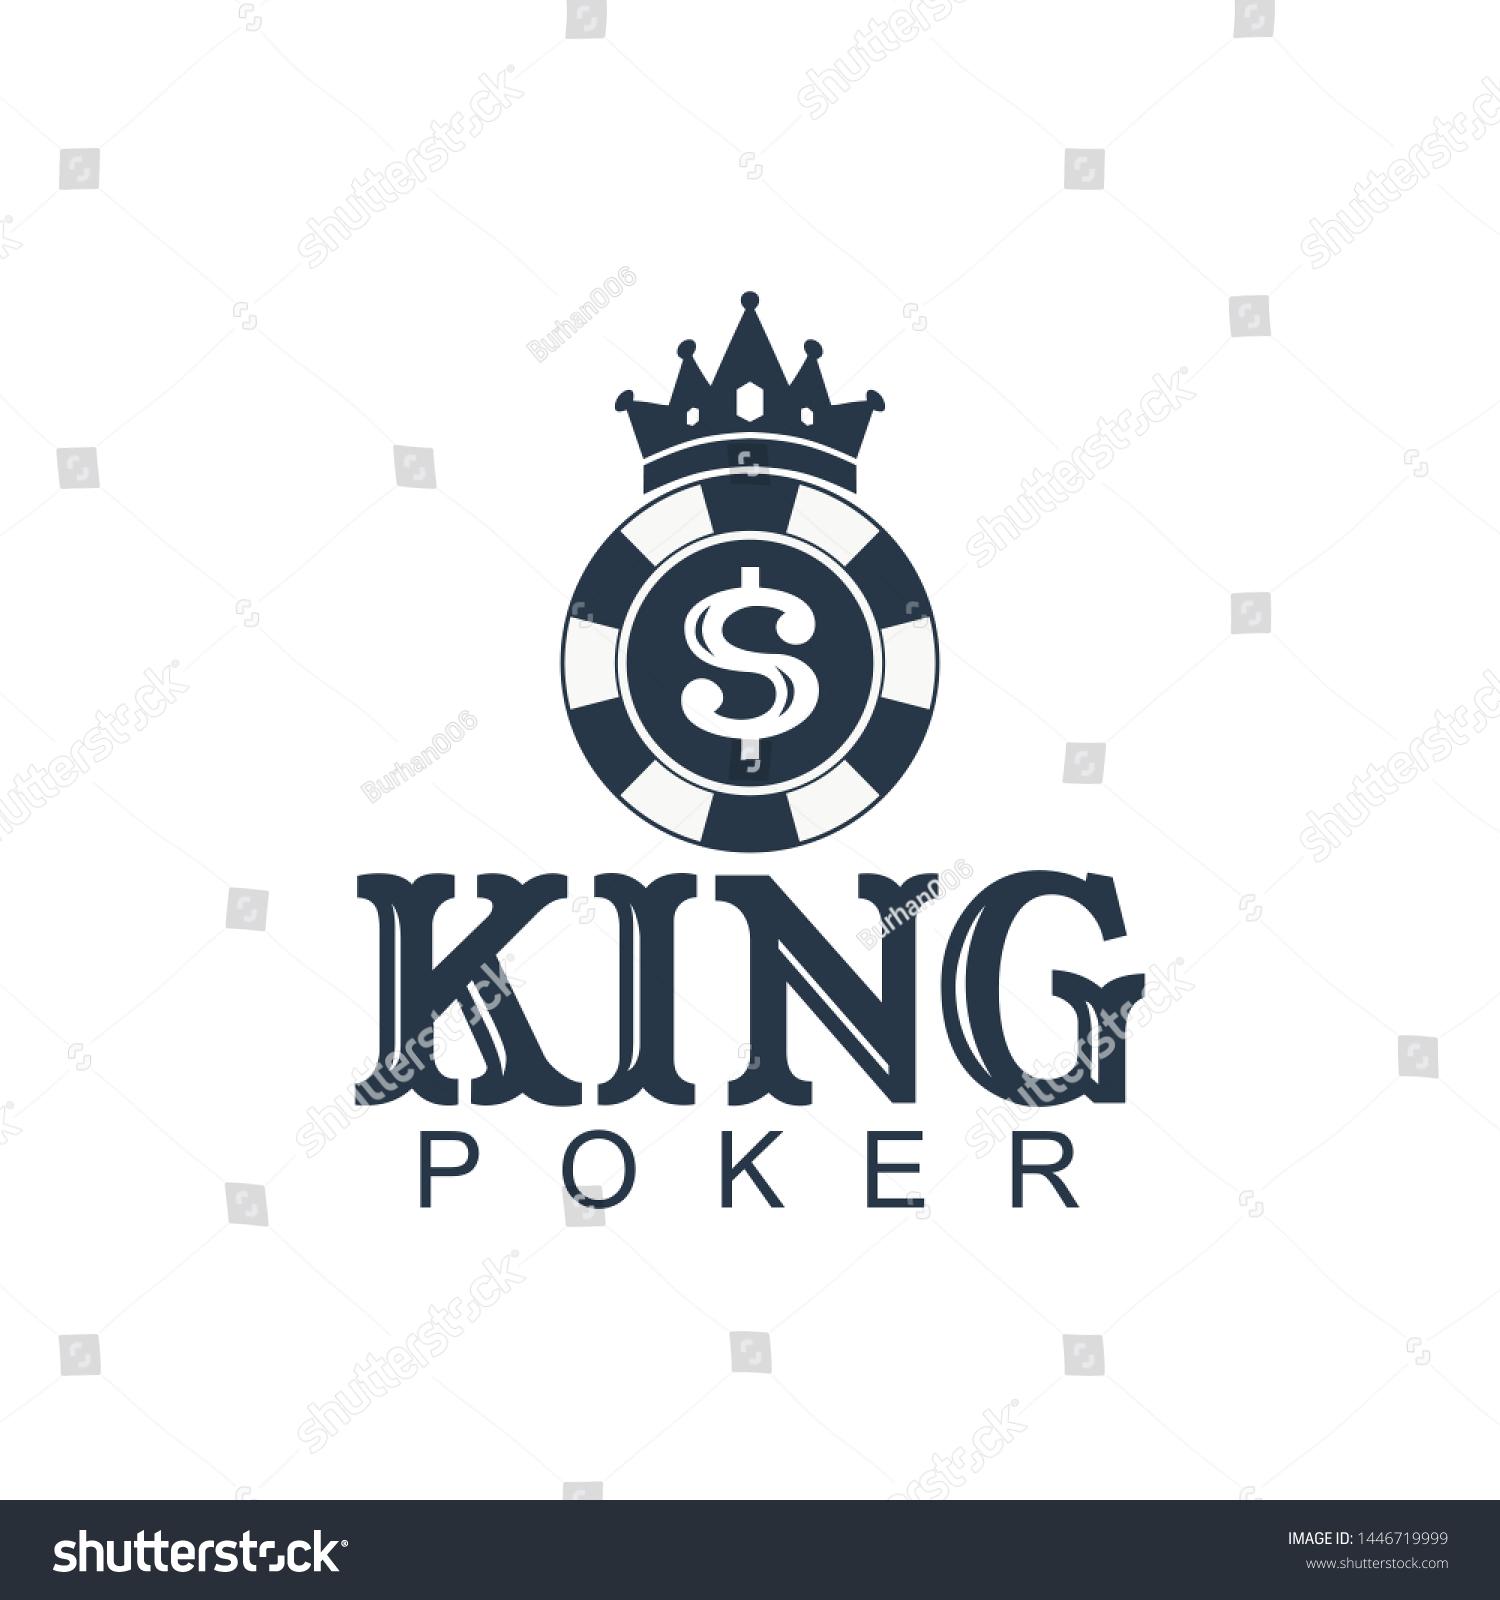 King Poker Logo Design Inspiration Stock Vector Royalty Free 1446719999